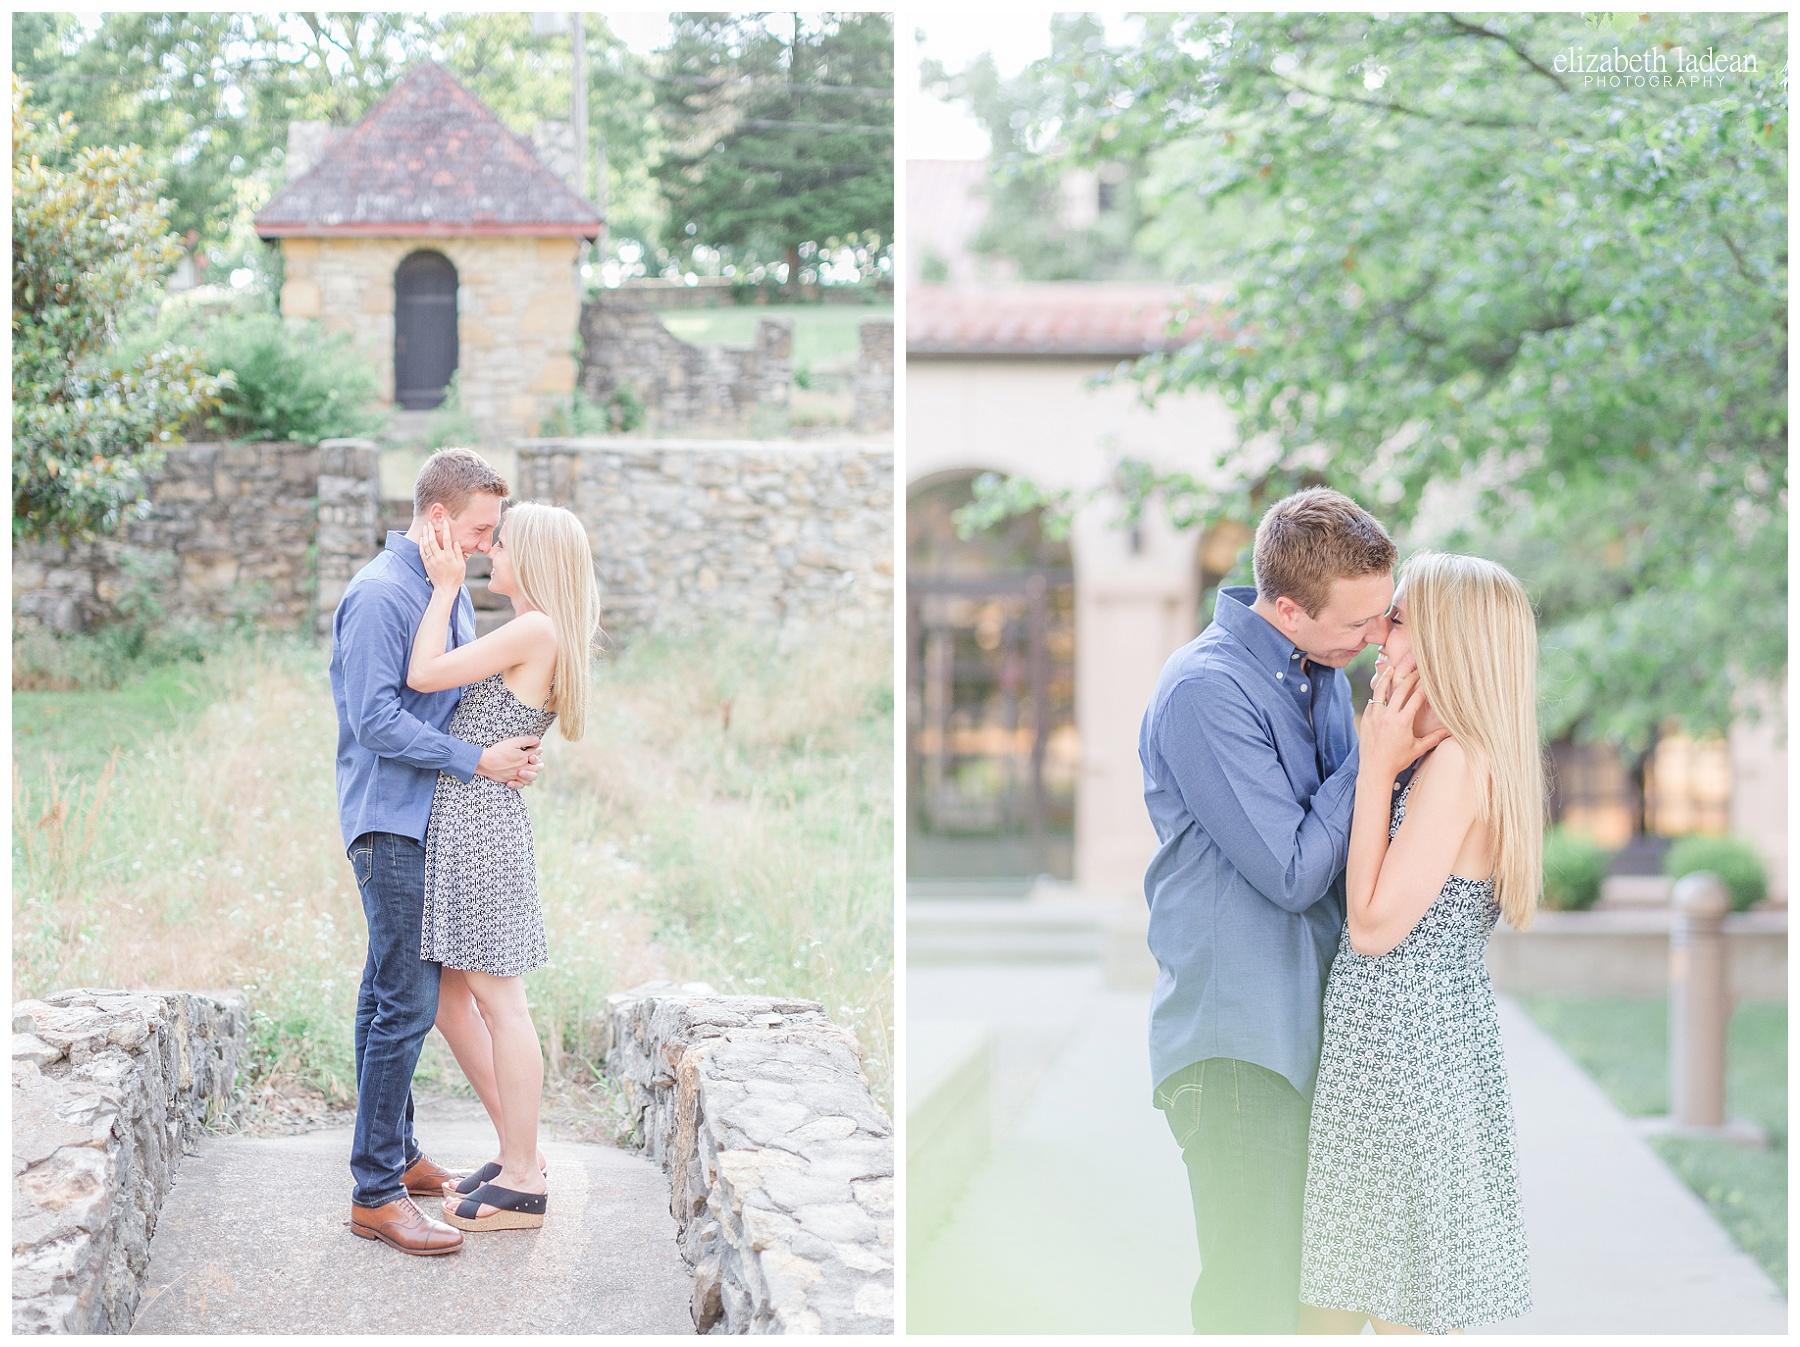 Engagement-Photos-Unity-Village-KC-Photography-A+R-Elizabeth-Ladean-Photography-photo_1369.jpg